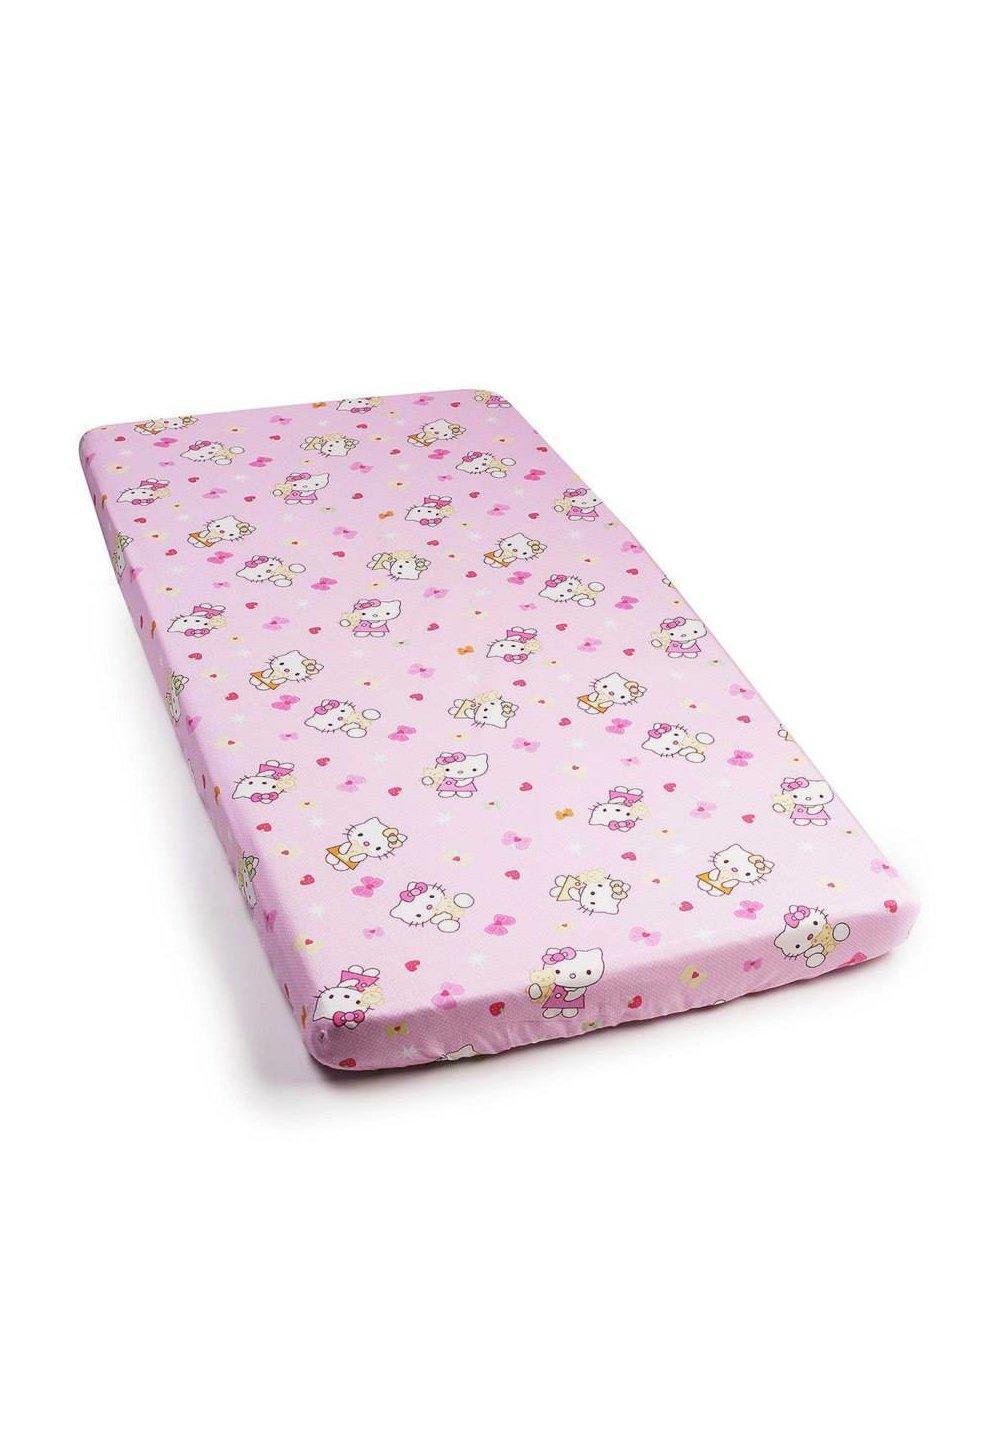 Cearceaf cu elastic, Hello Kitty, roz deschis 120x60 cm imagine